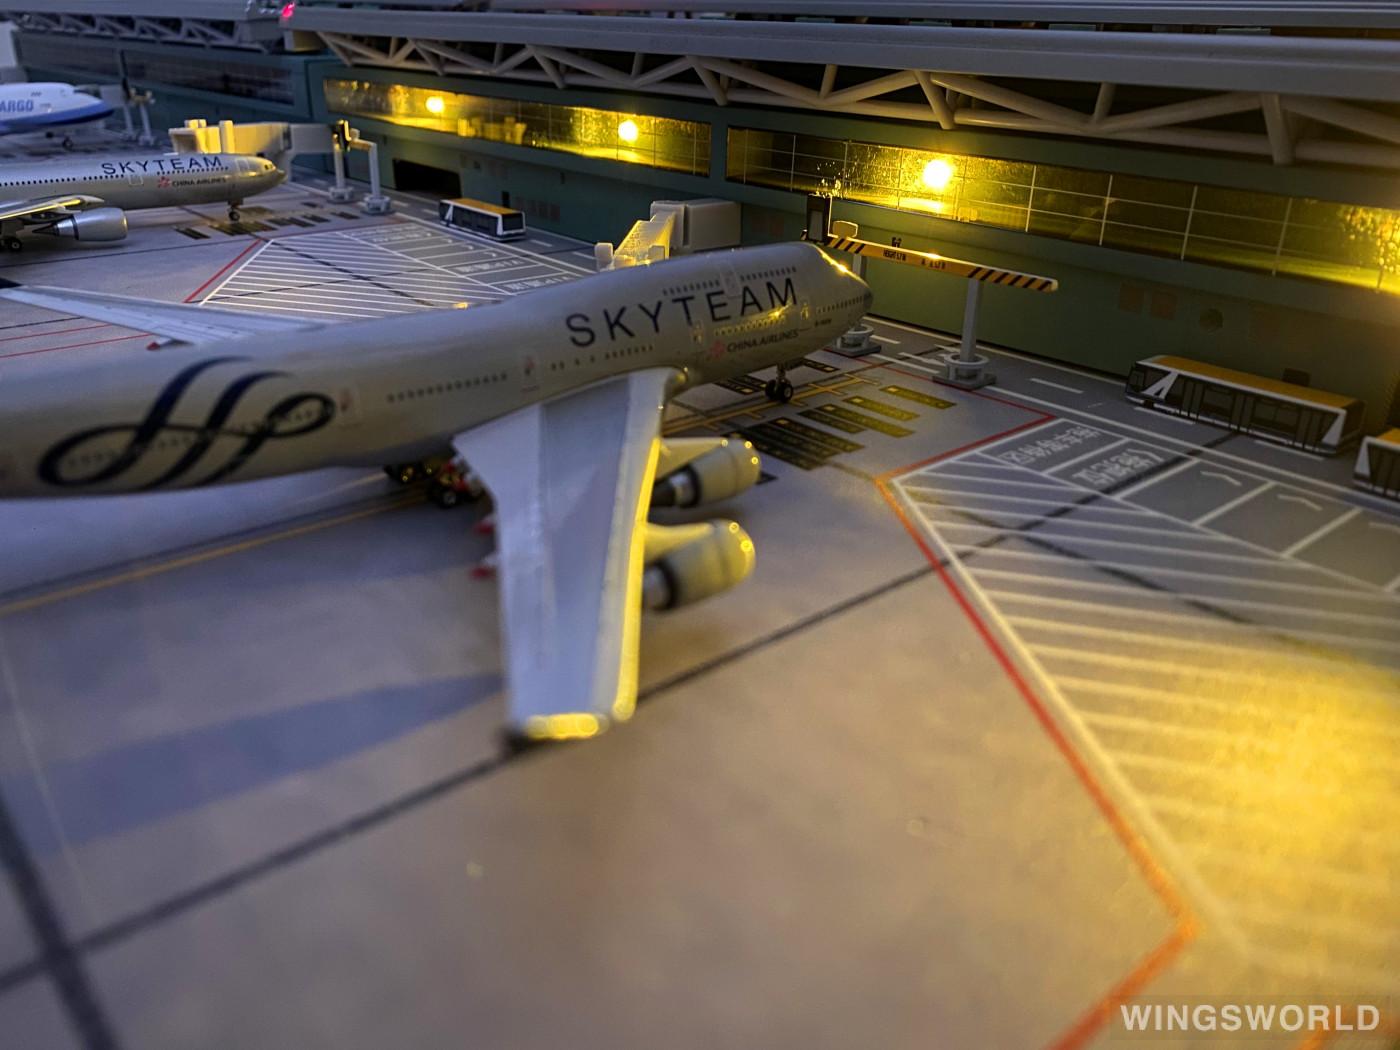 Phoenix 1:400 PH10575 China Airlines 中华航空 Boeing 747-400 B-18206